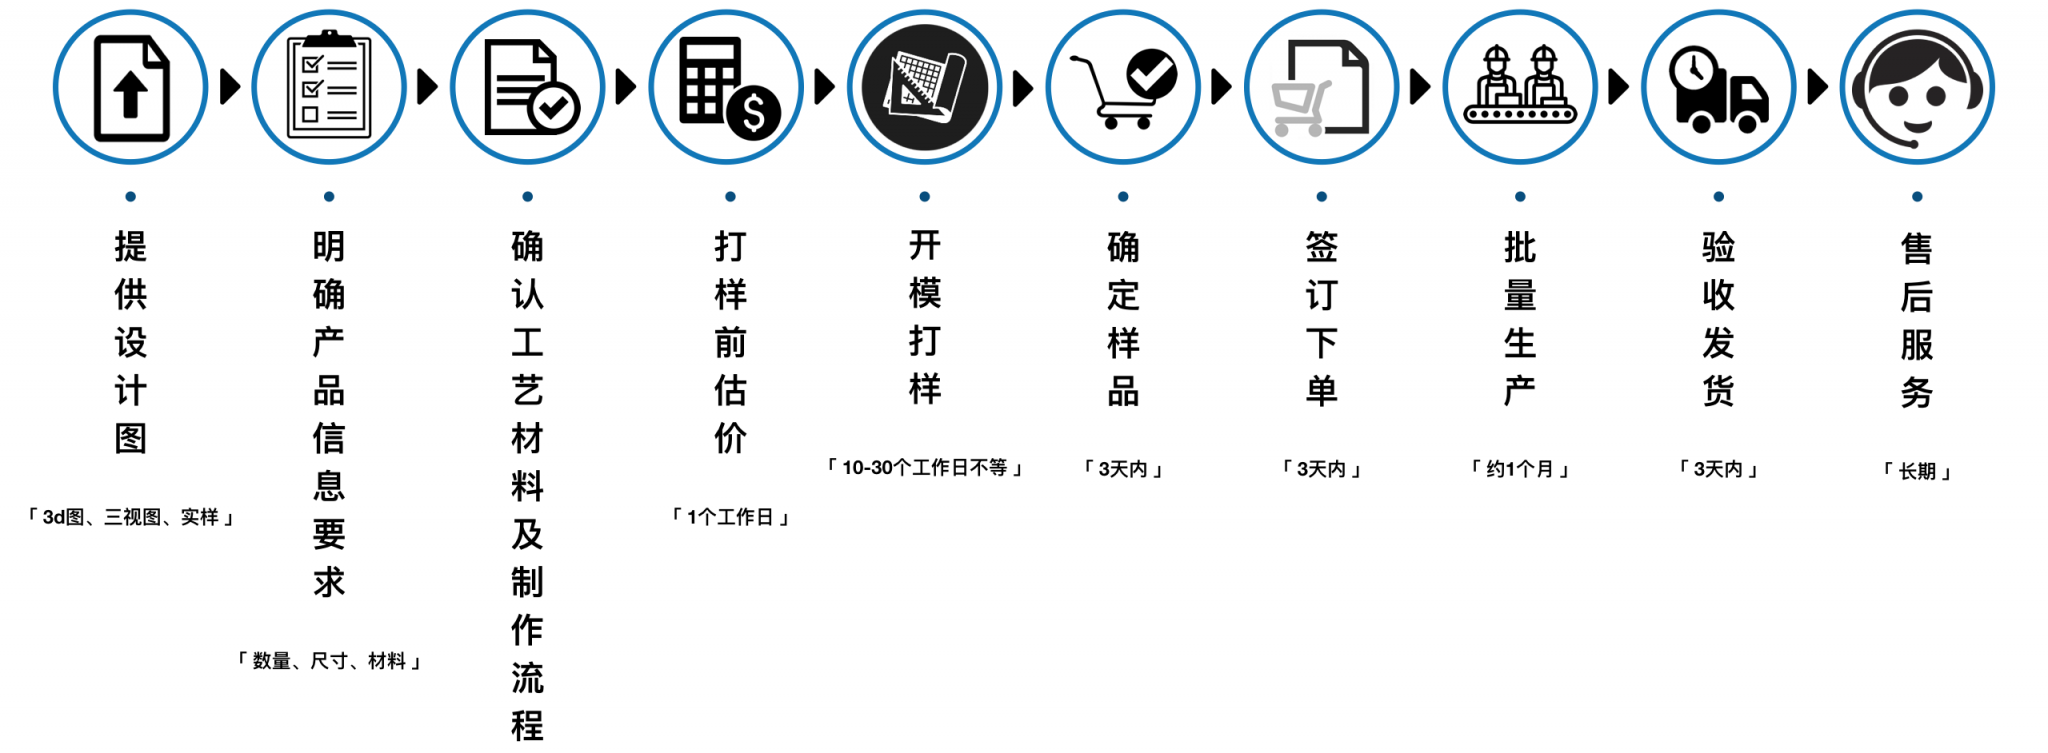 86fashion 上海华声 定制流程图